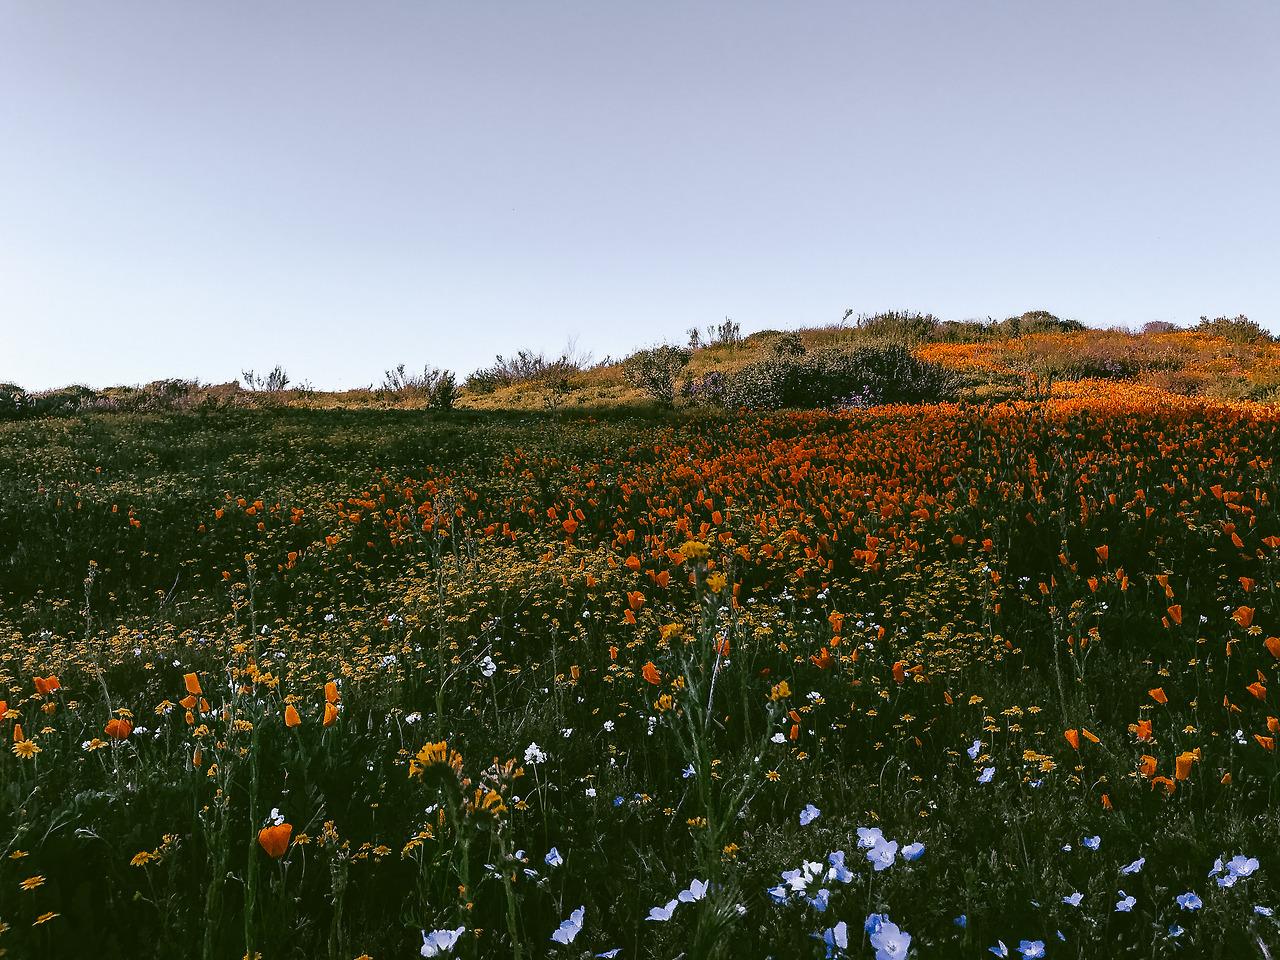 Field Of Wildflowers Tumblr